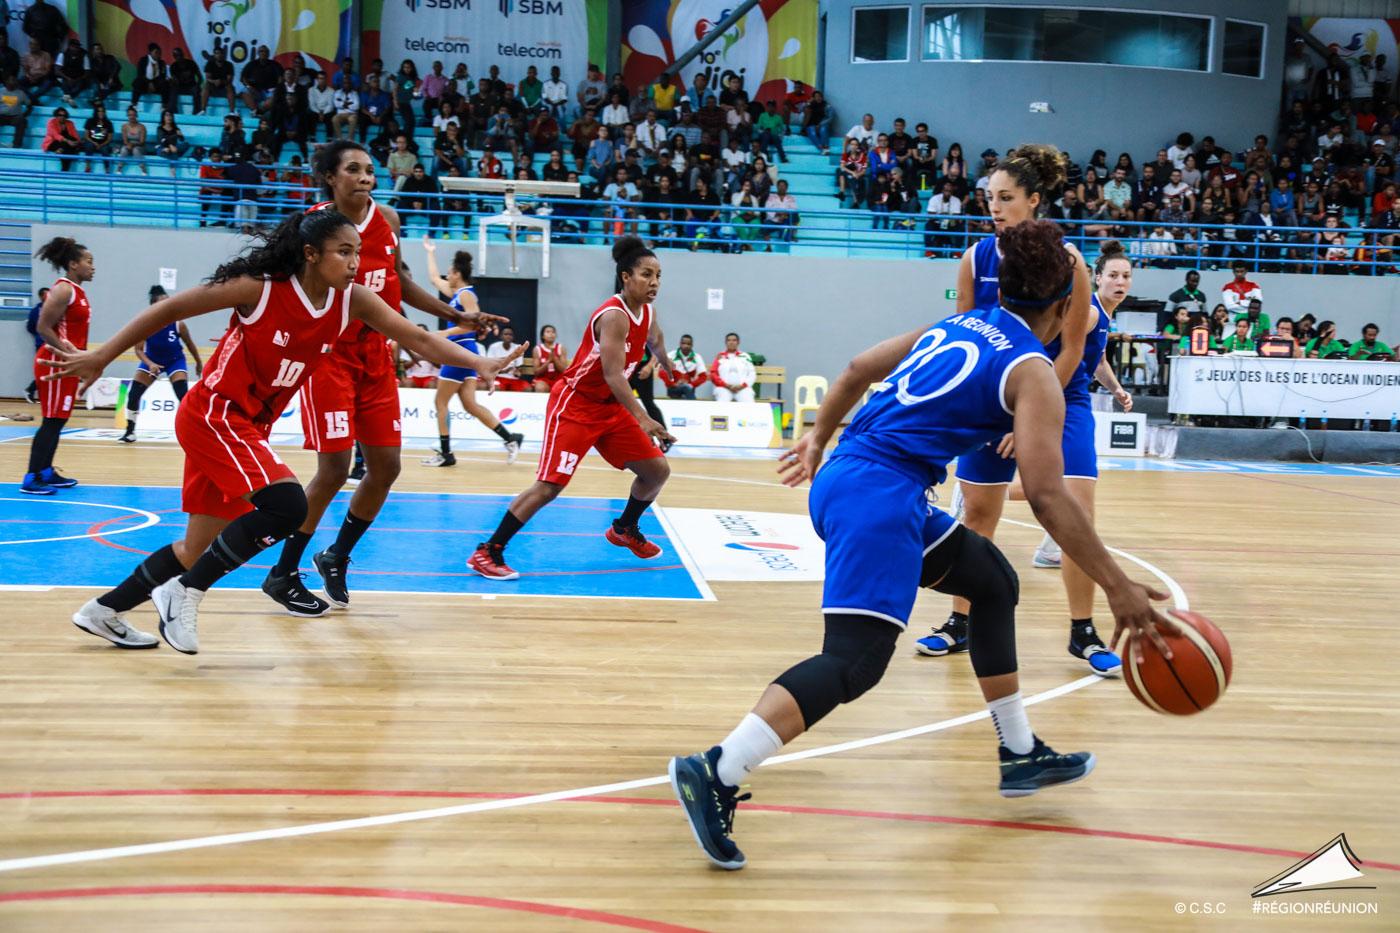 JIOI : Finale Basket-Ball (dames) : Réunion / Madagascar